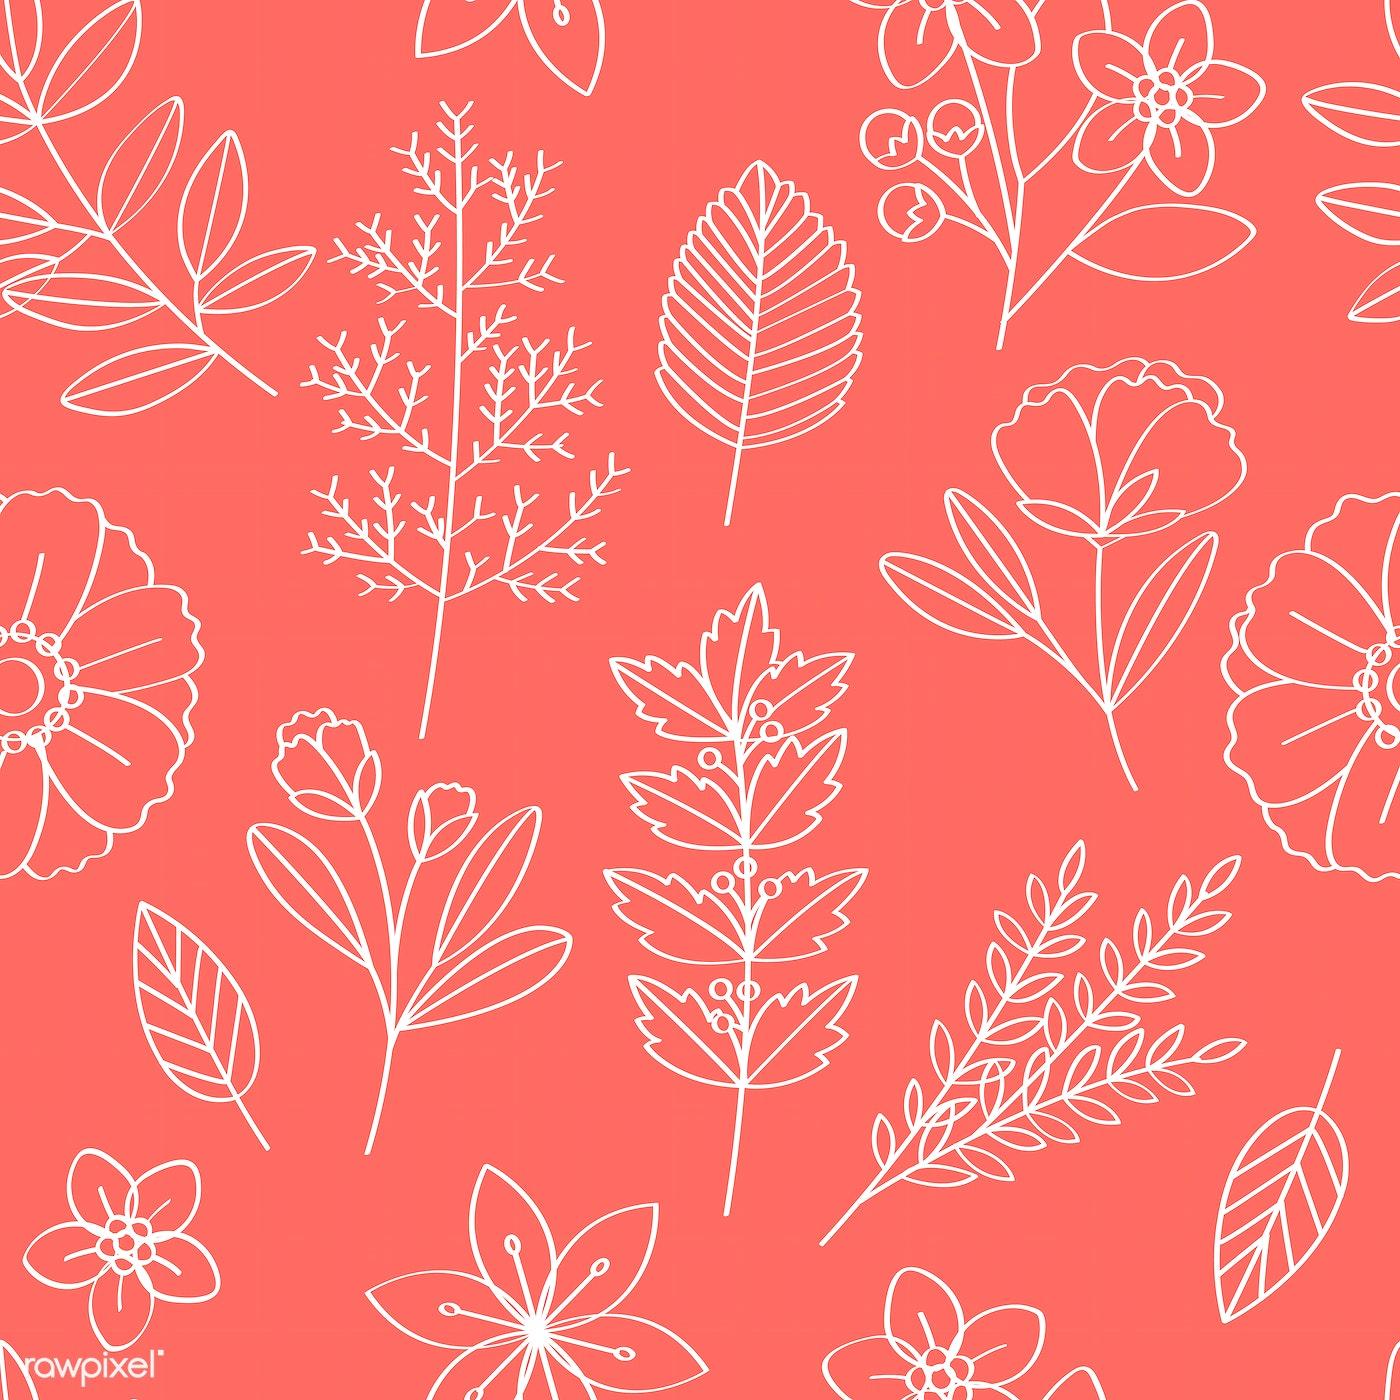 Floral patterned background | Free stock illustration - 389203